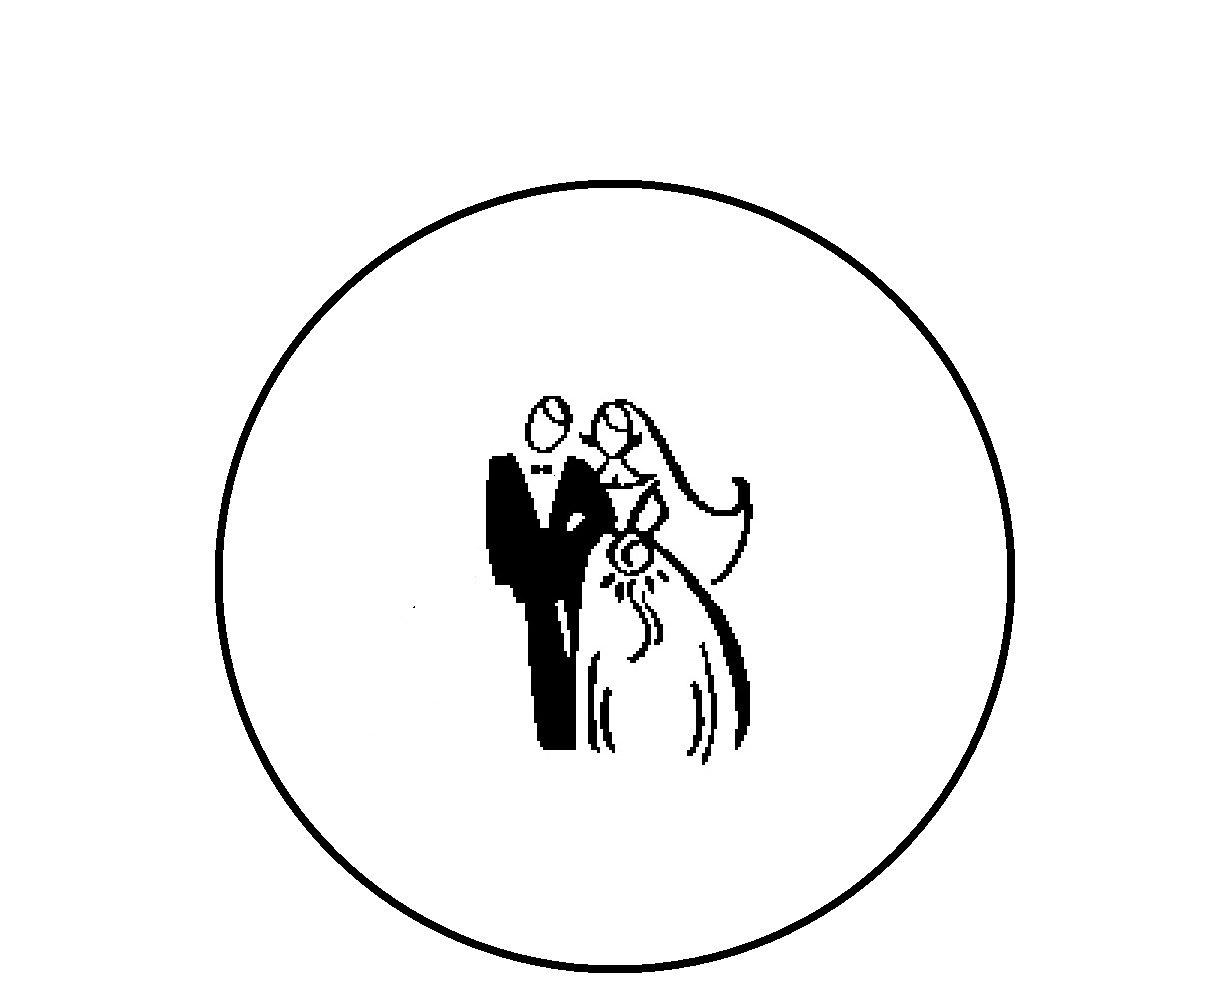 Bride And Groom Silhouette Free Clip Art At Getdrawings